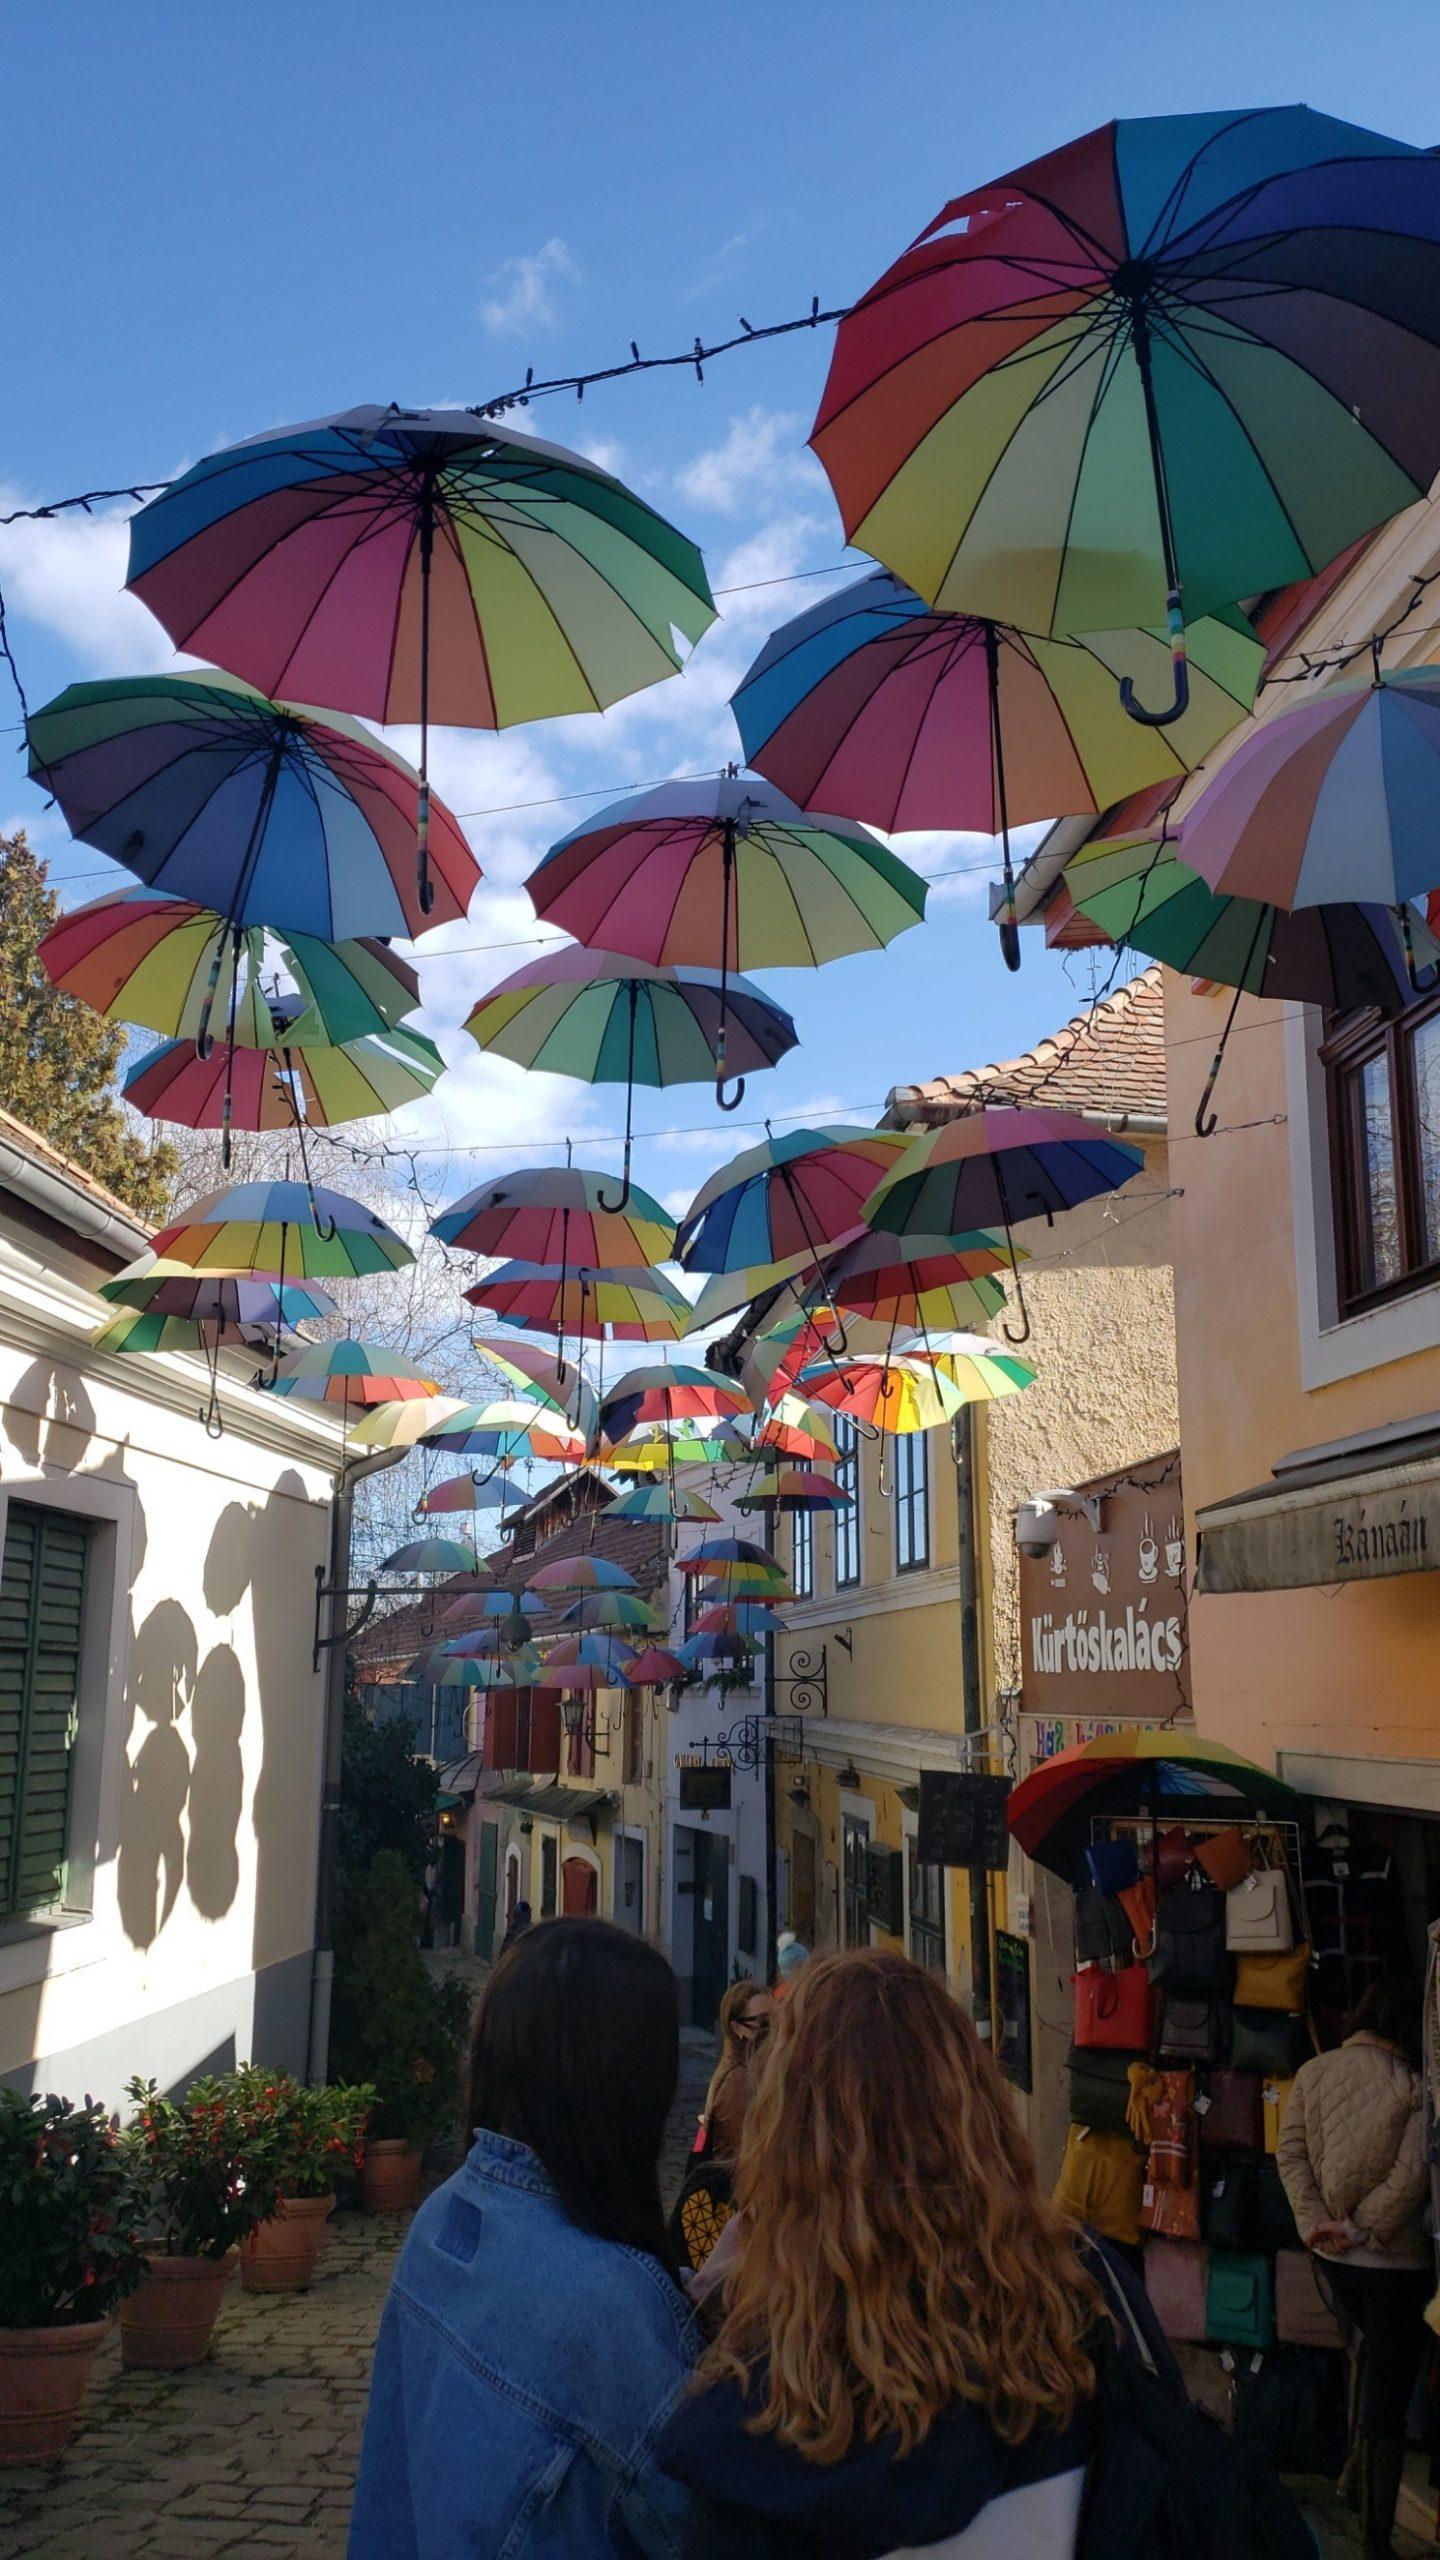 colourful umbrellas hang over alleyway between buildings during daytime